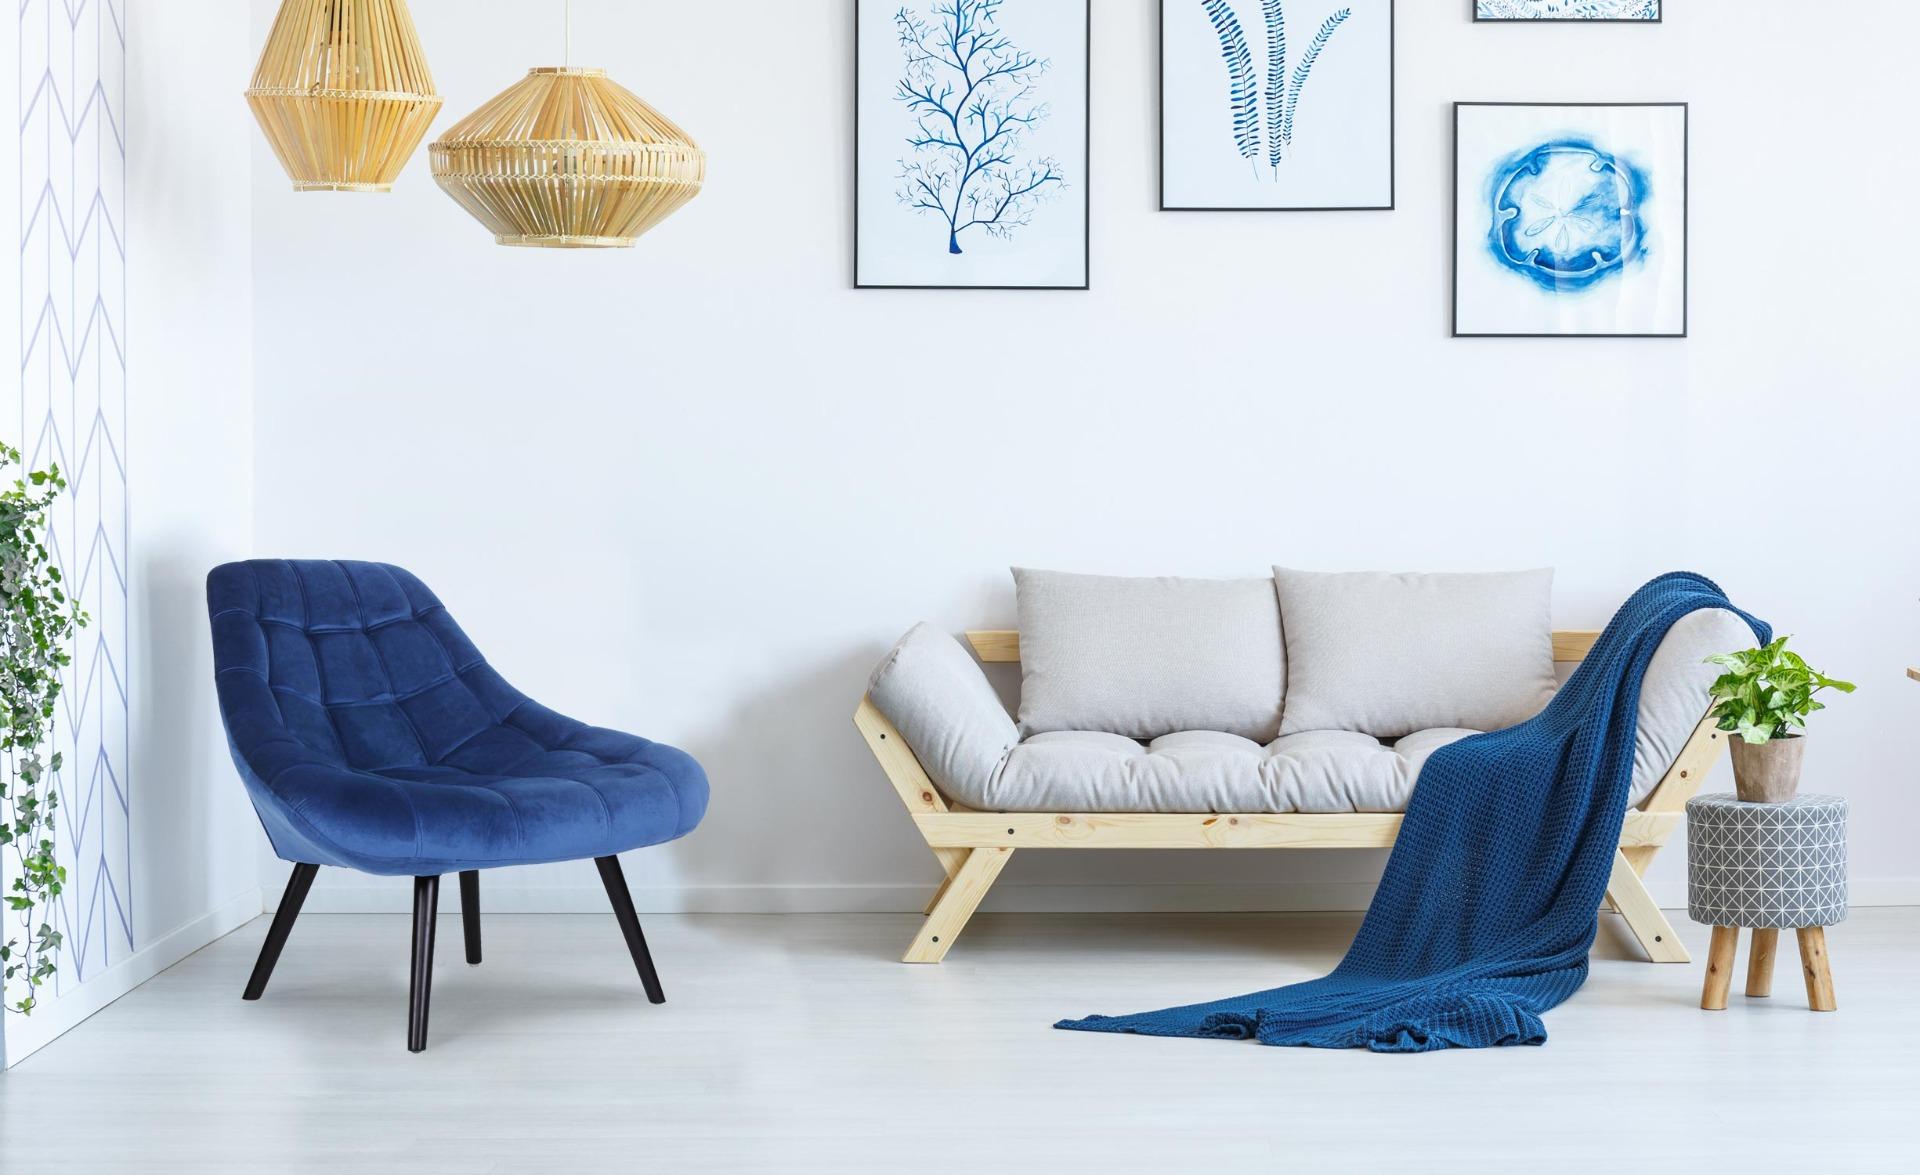 Set di 2 poltrone Danios Velluto Blu